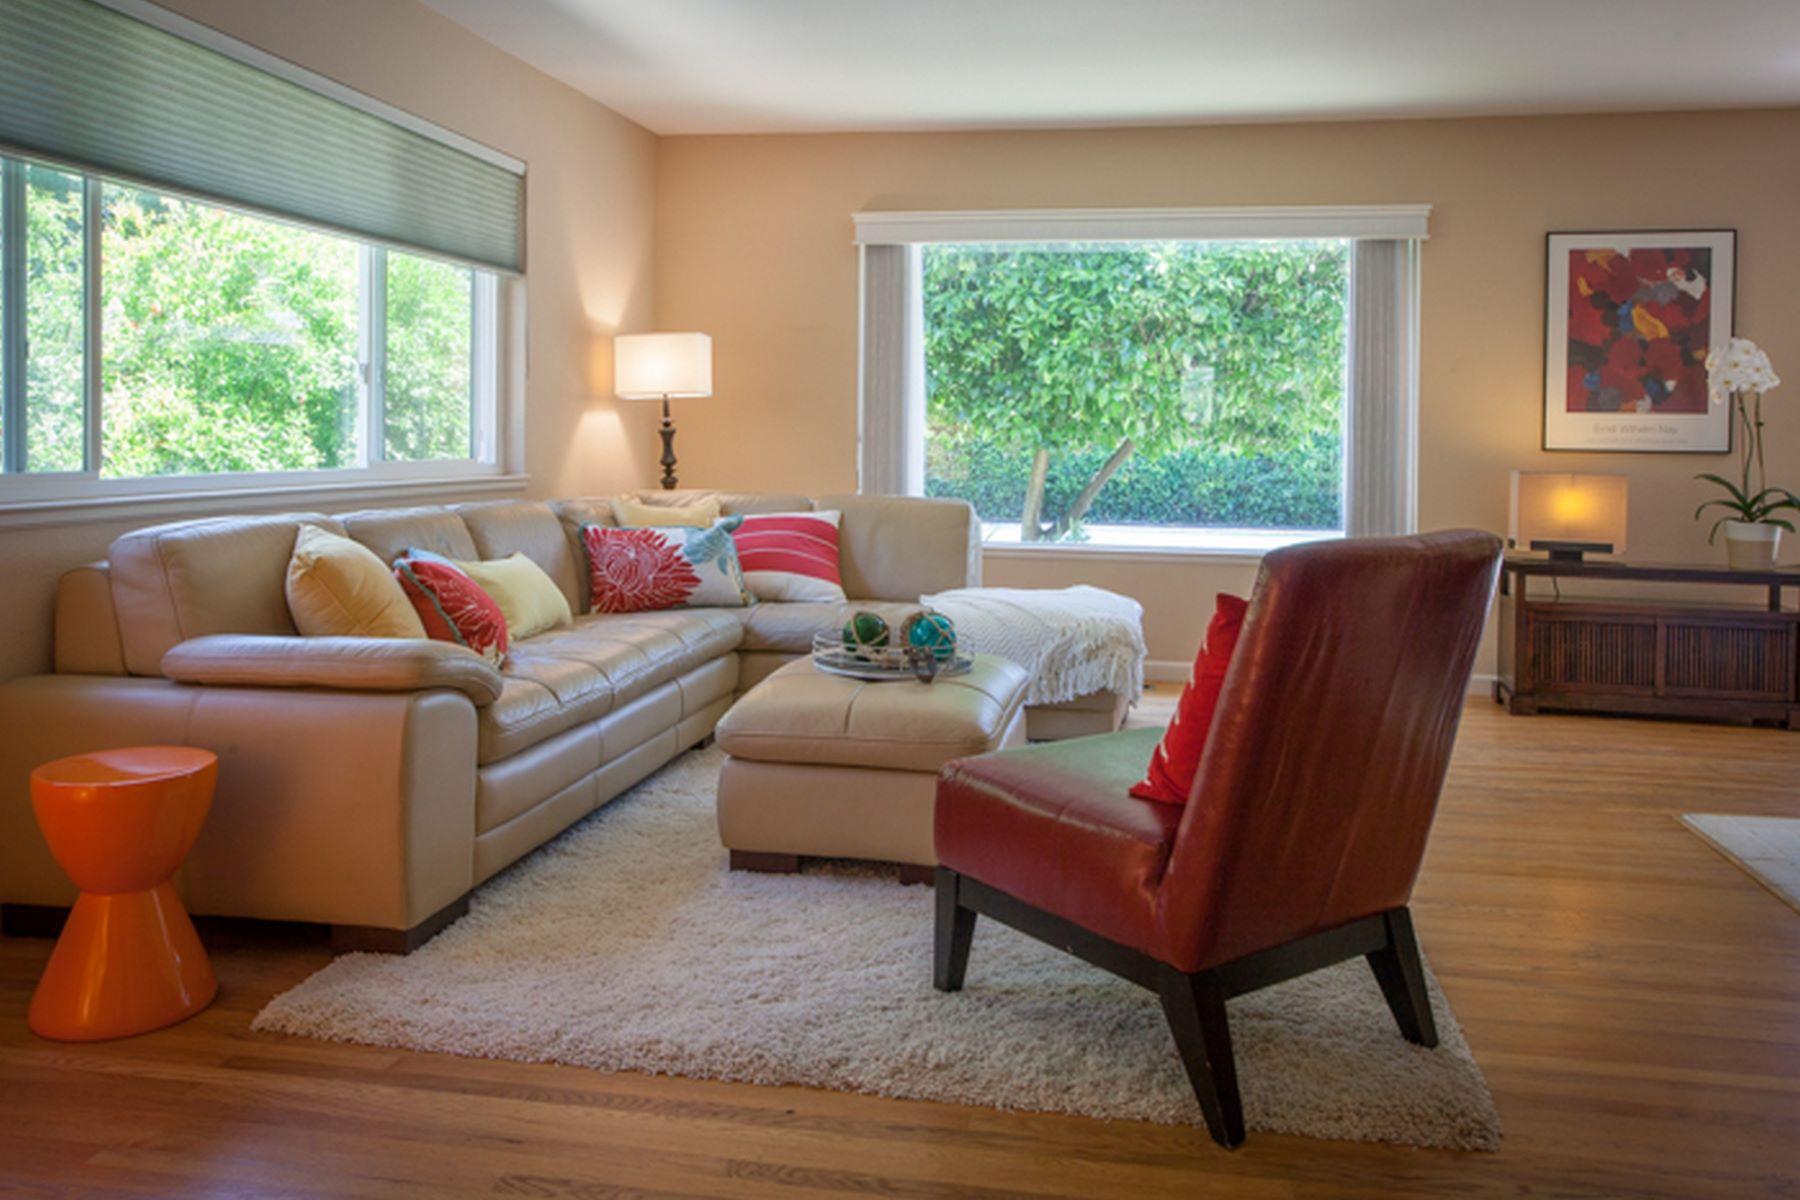 獨棟家庭住宅 為 出售 在 Kentfield-Settle In and Enjoy Marin Lifestyle 729 Sir Francis Drake Blvd Kentfield, 加利福尼亞州 94904 美國